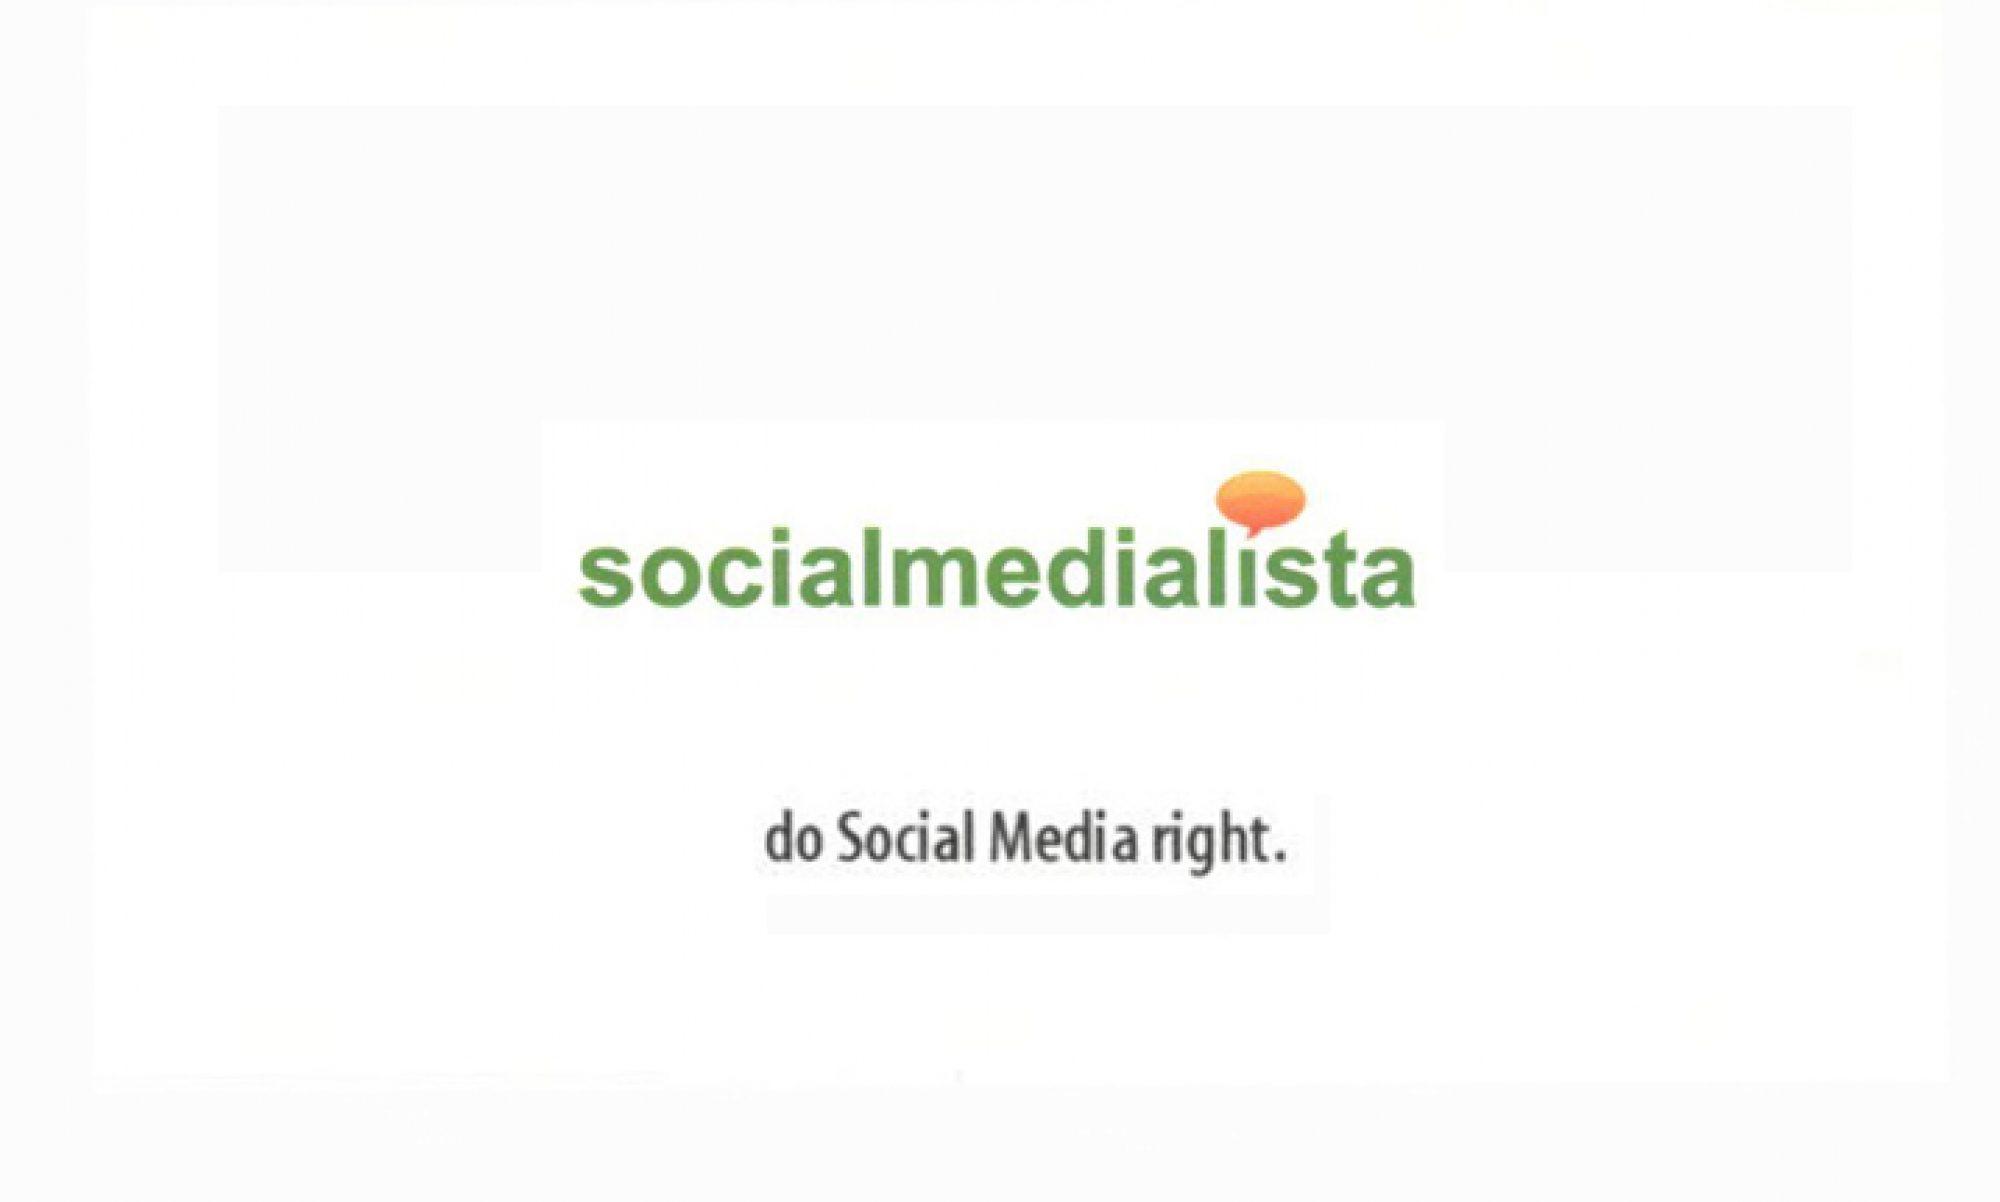 socialmedialista